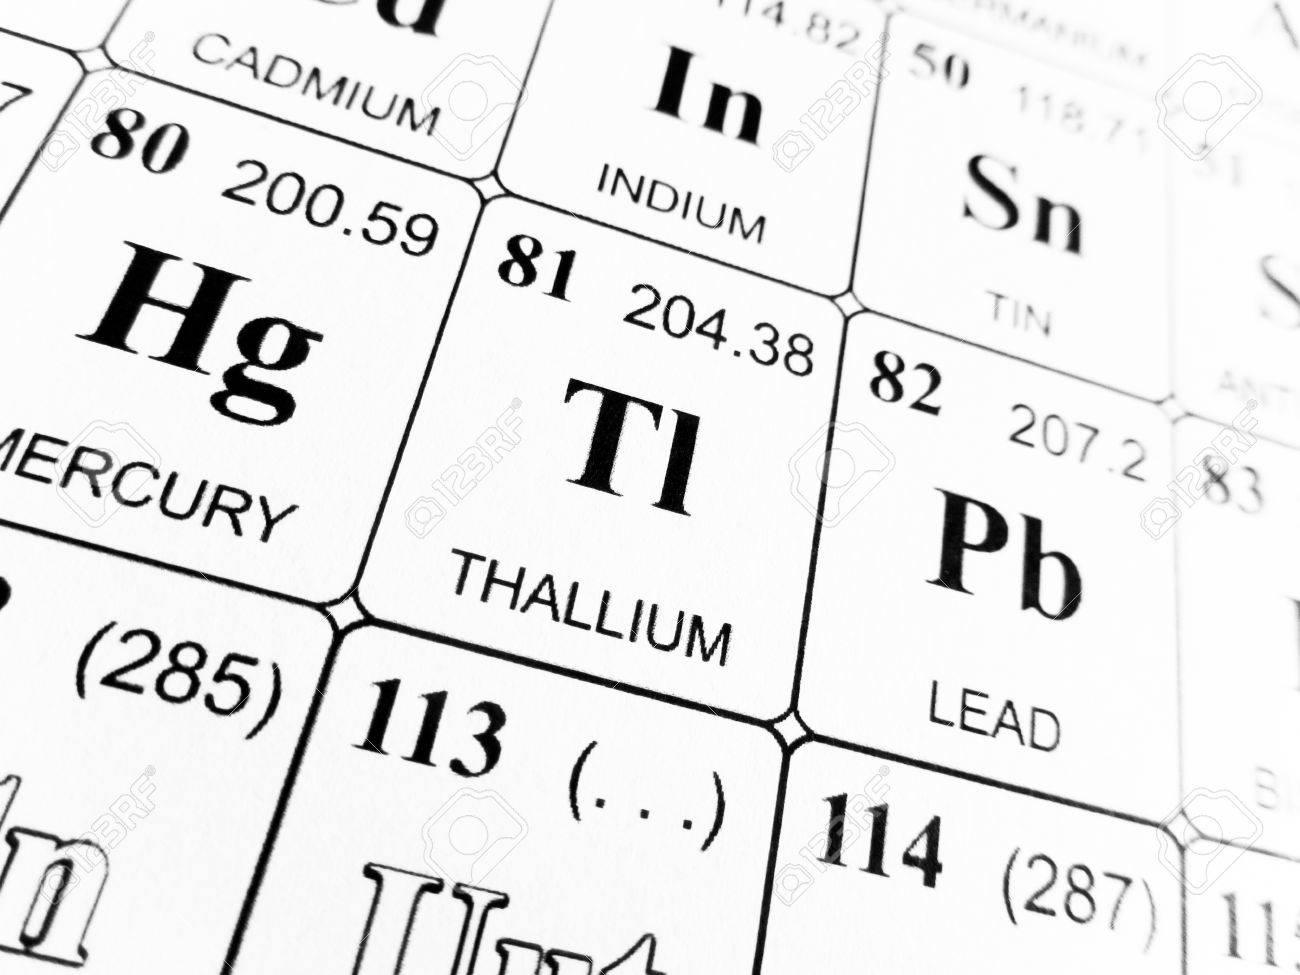 Indium on the periodic table gallery periodic table images cadmium on periodic table image collections periodic table images periodic table thallium images periodic table images gamestrikefo Images